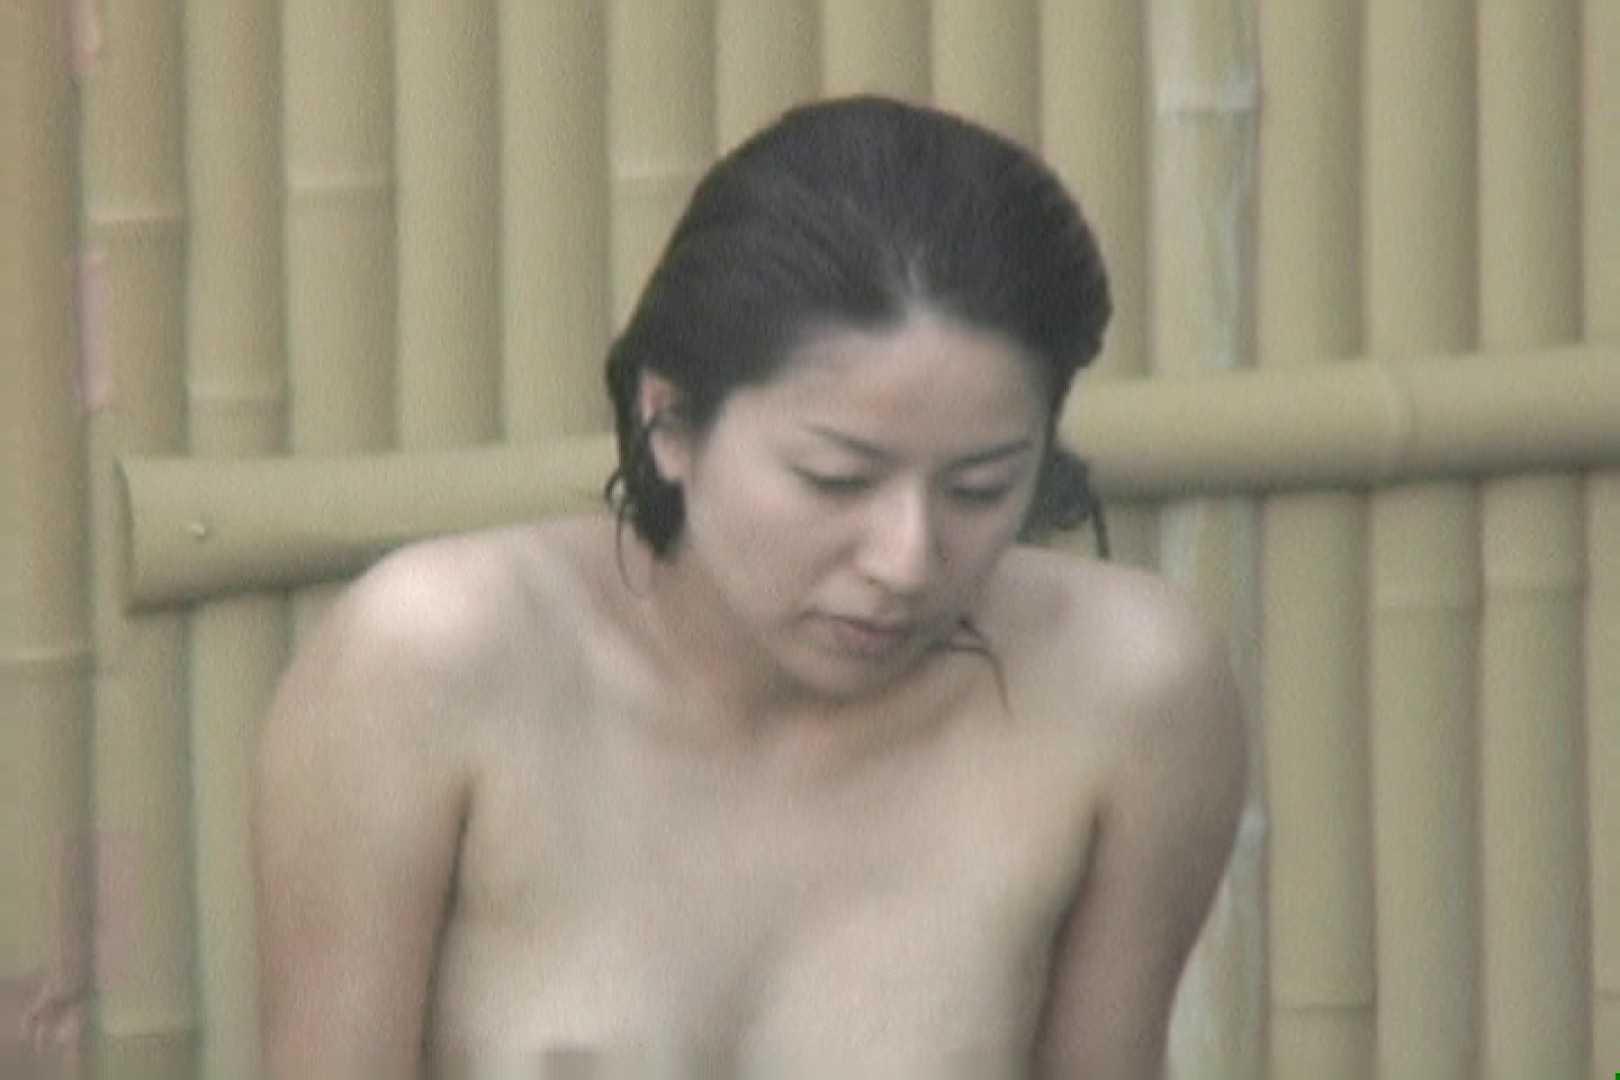 Aquaな露天風呂Vol.694 盗撮 | OLエロ画像  110PICs 70